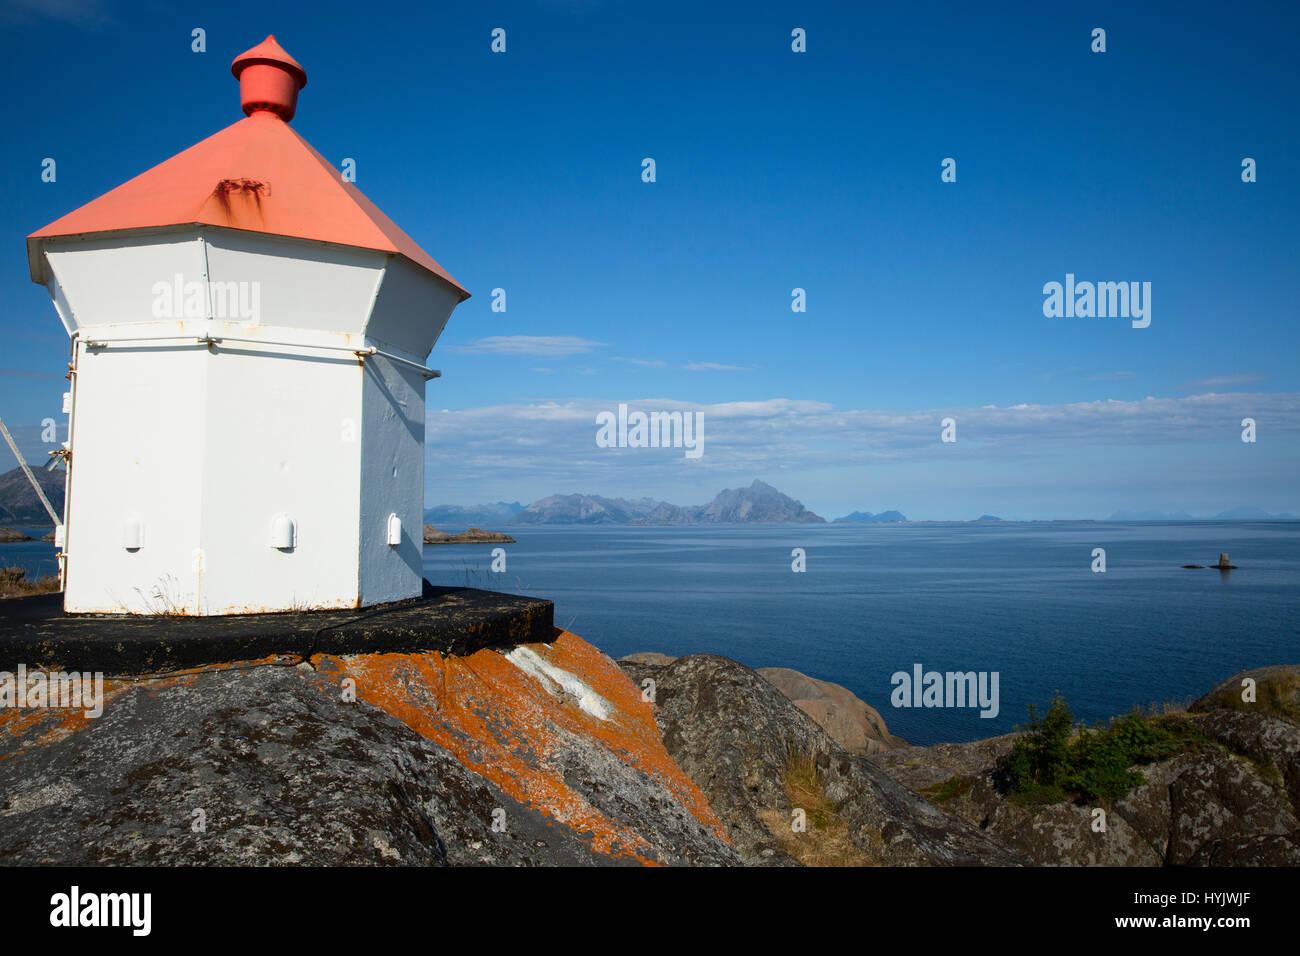 Europe,Norway,Lofoten,Vestvagoy,lighthouse - Stock Image